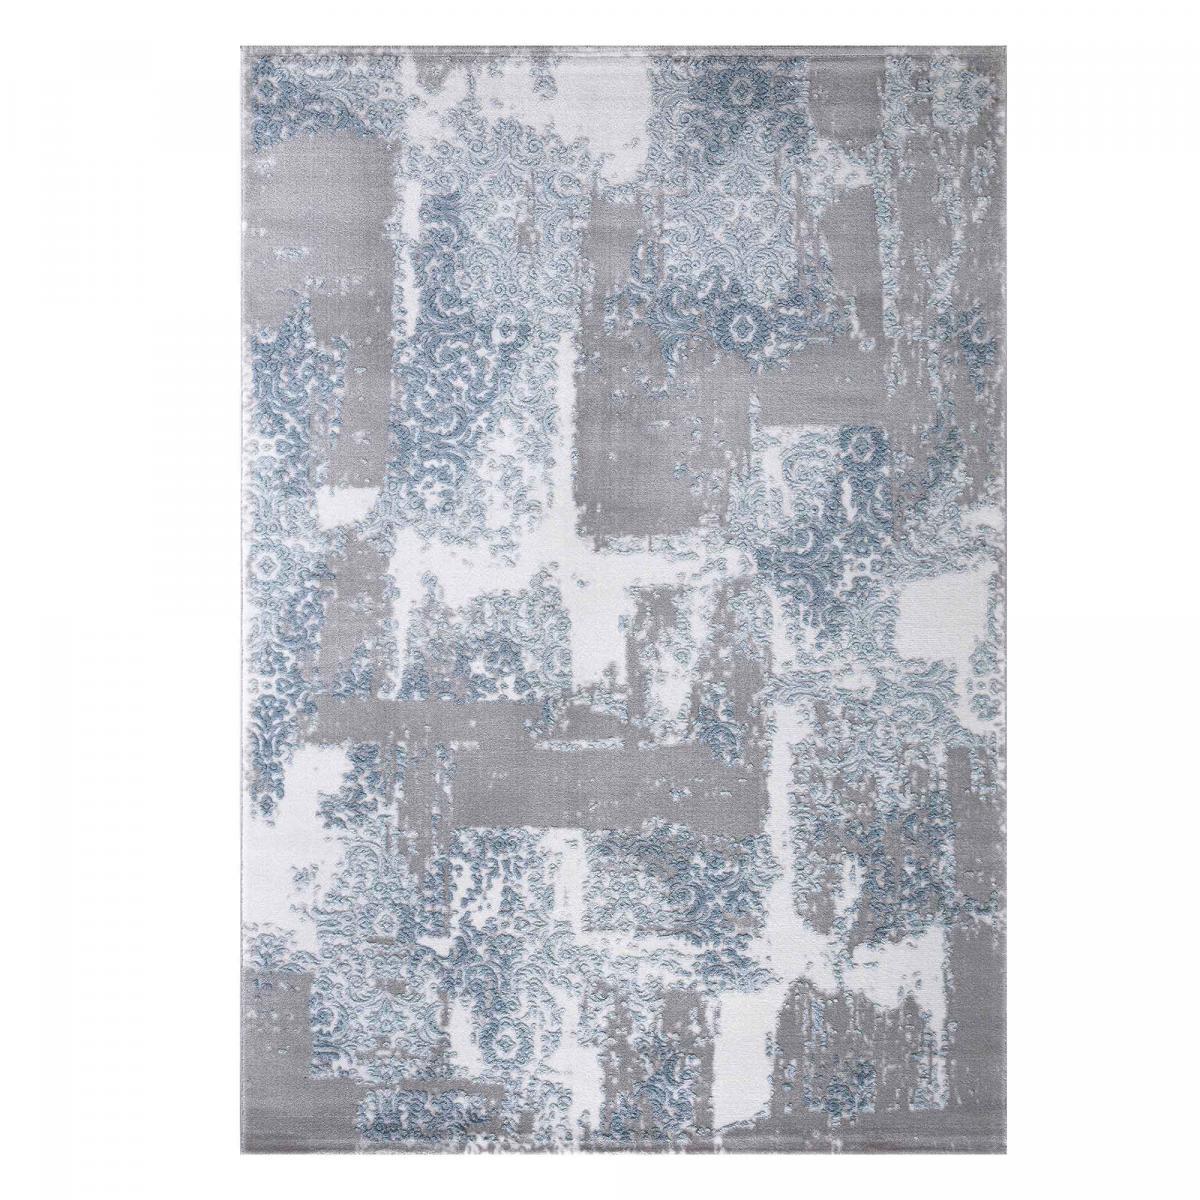 Tapis design en acrylique bleu 120x180